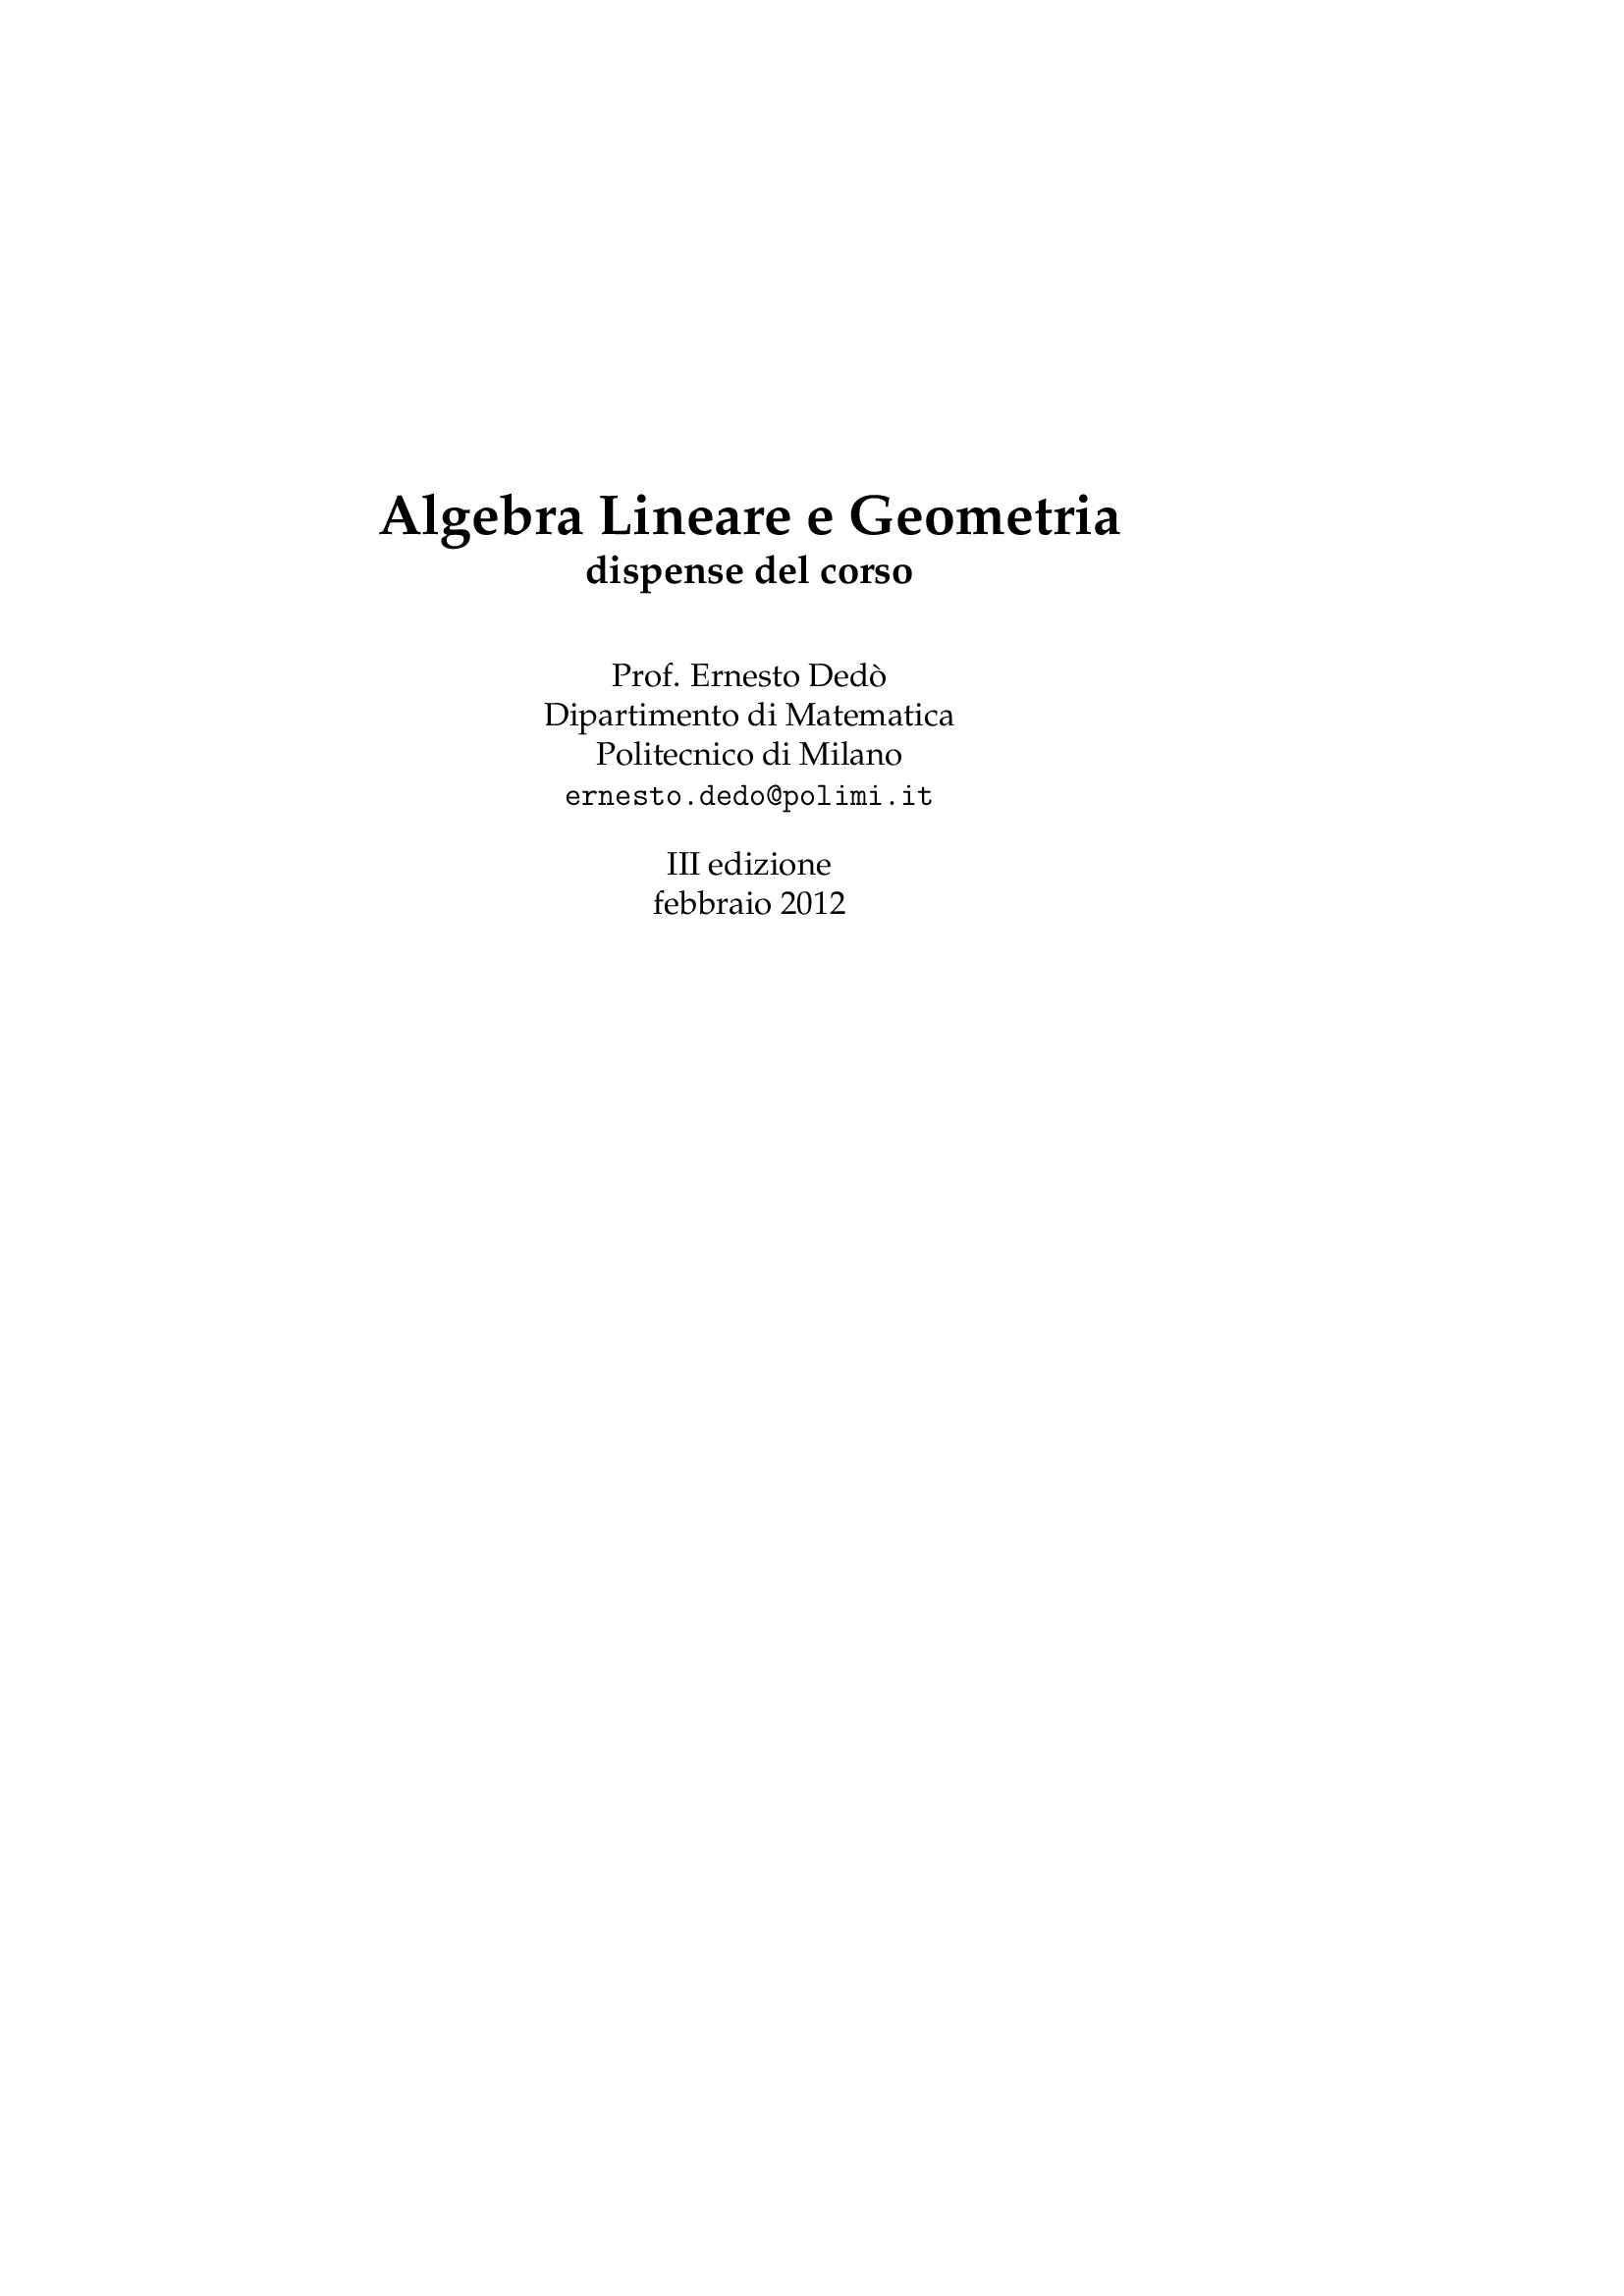 Dispensa di Matematica - Algebra lineare e geometria